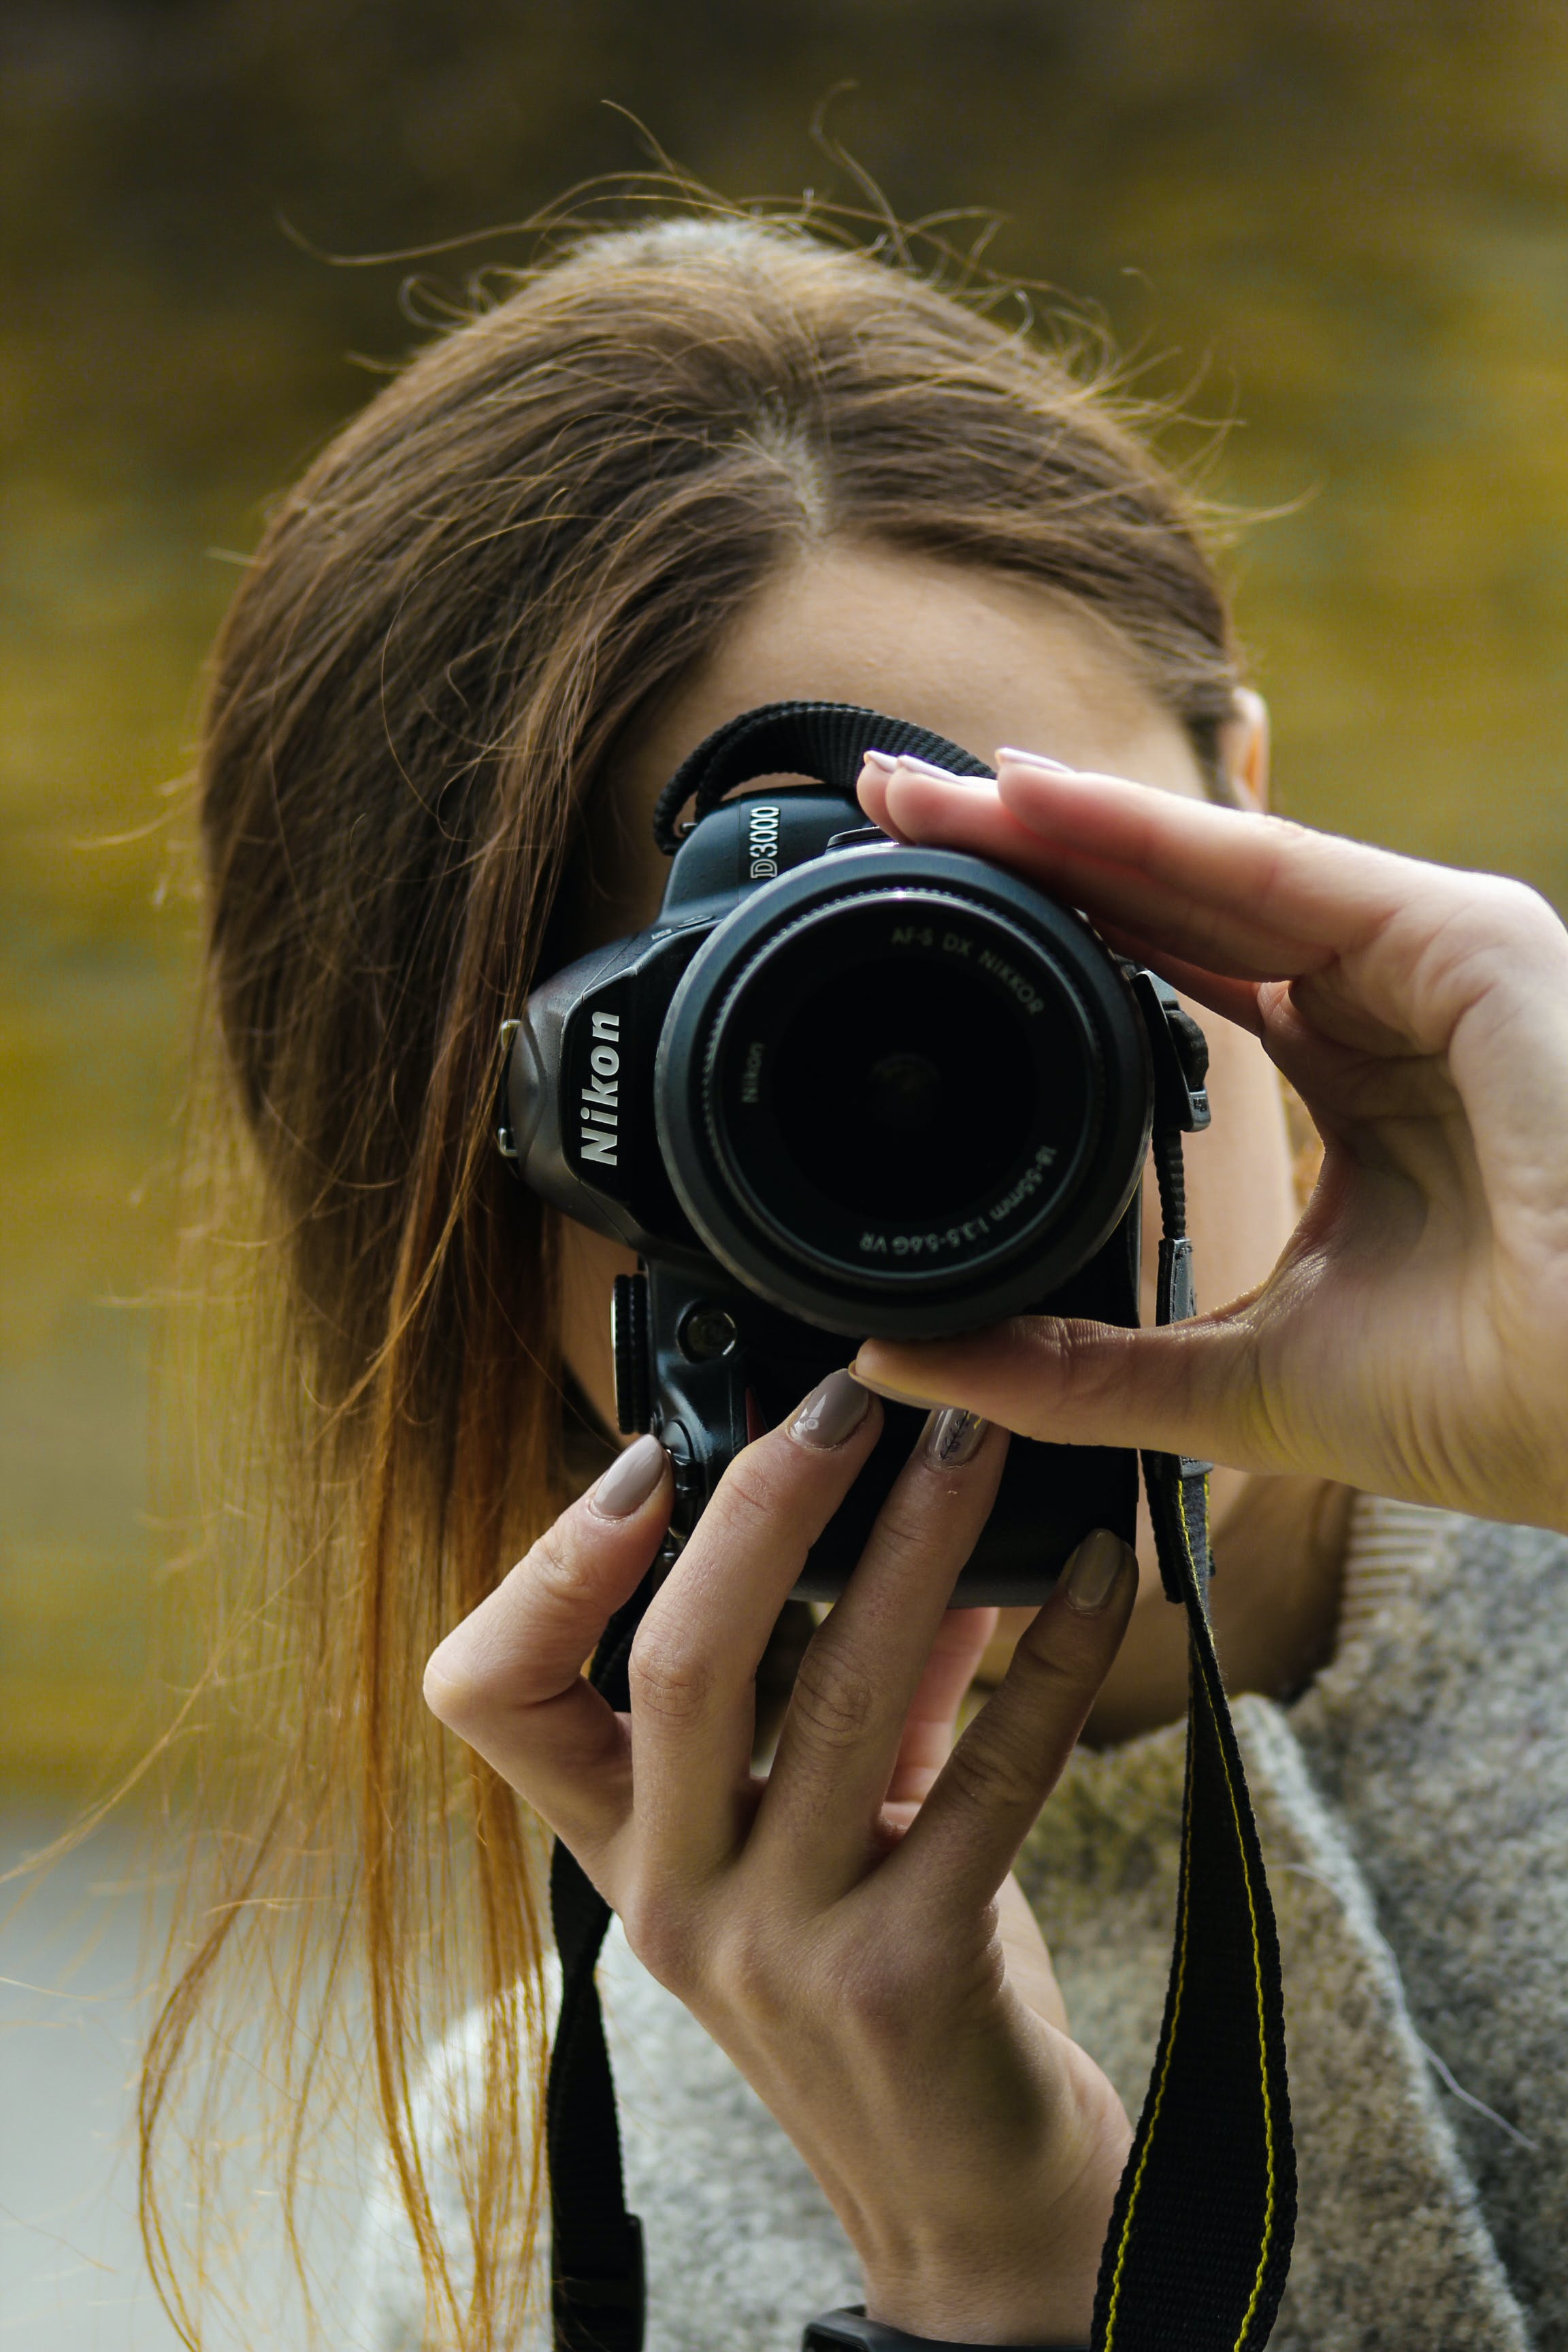 Close-up Photography of Woman Using Black Nikon Dslr Camera